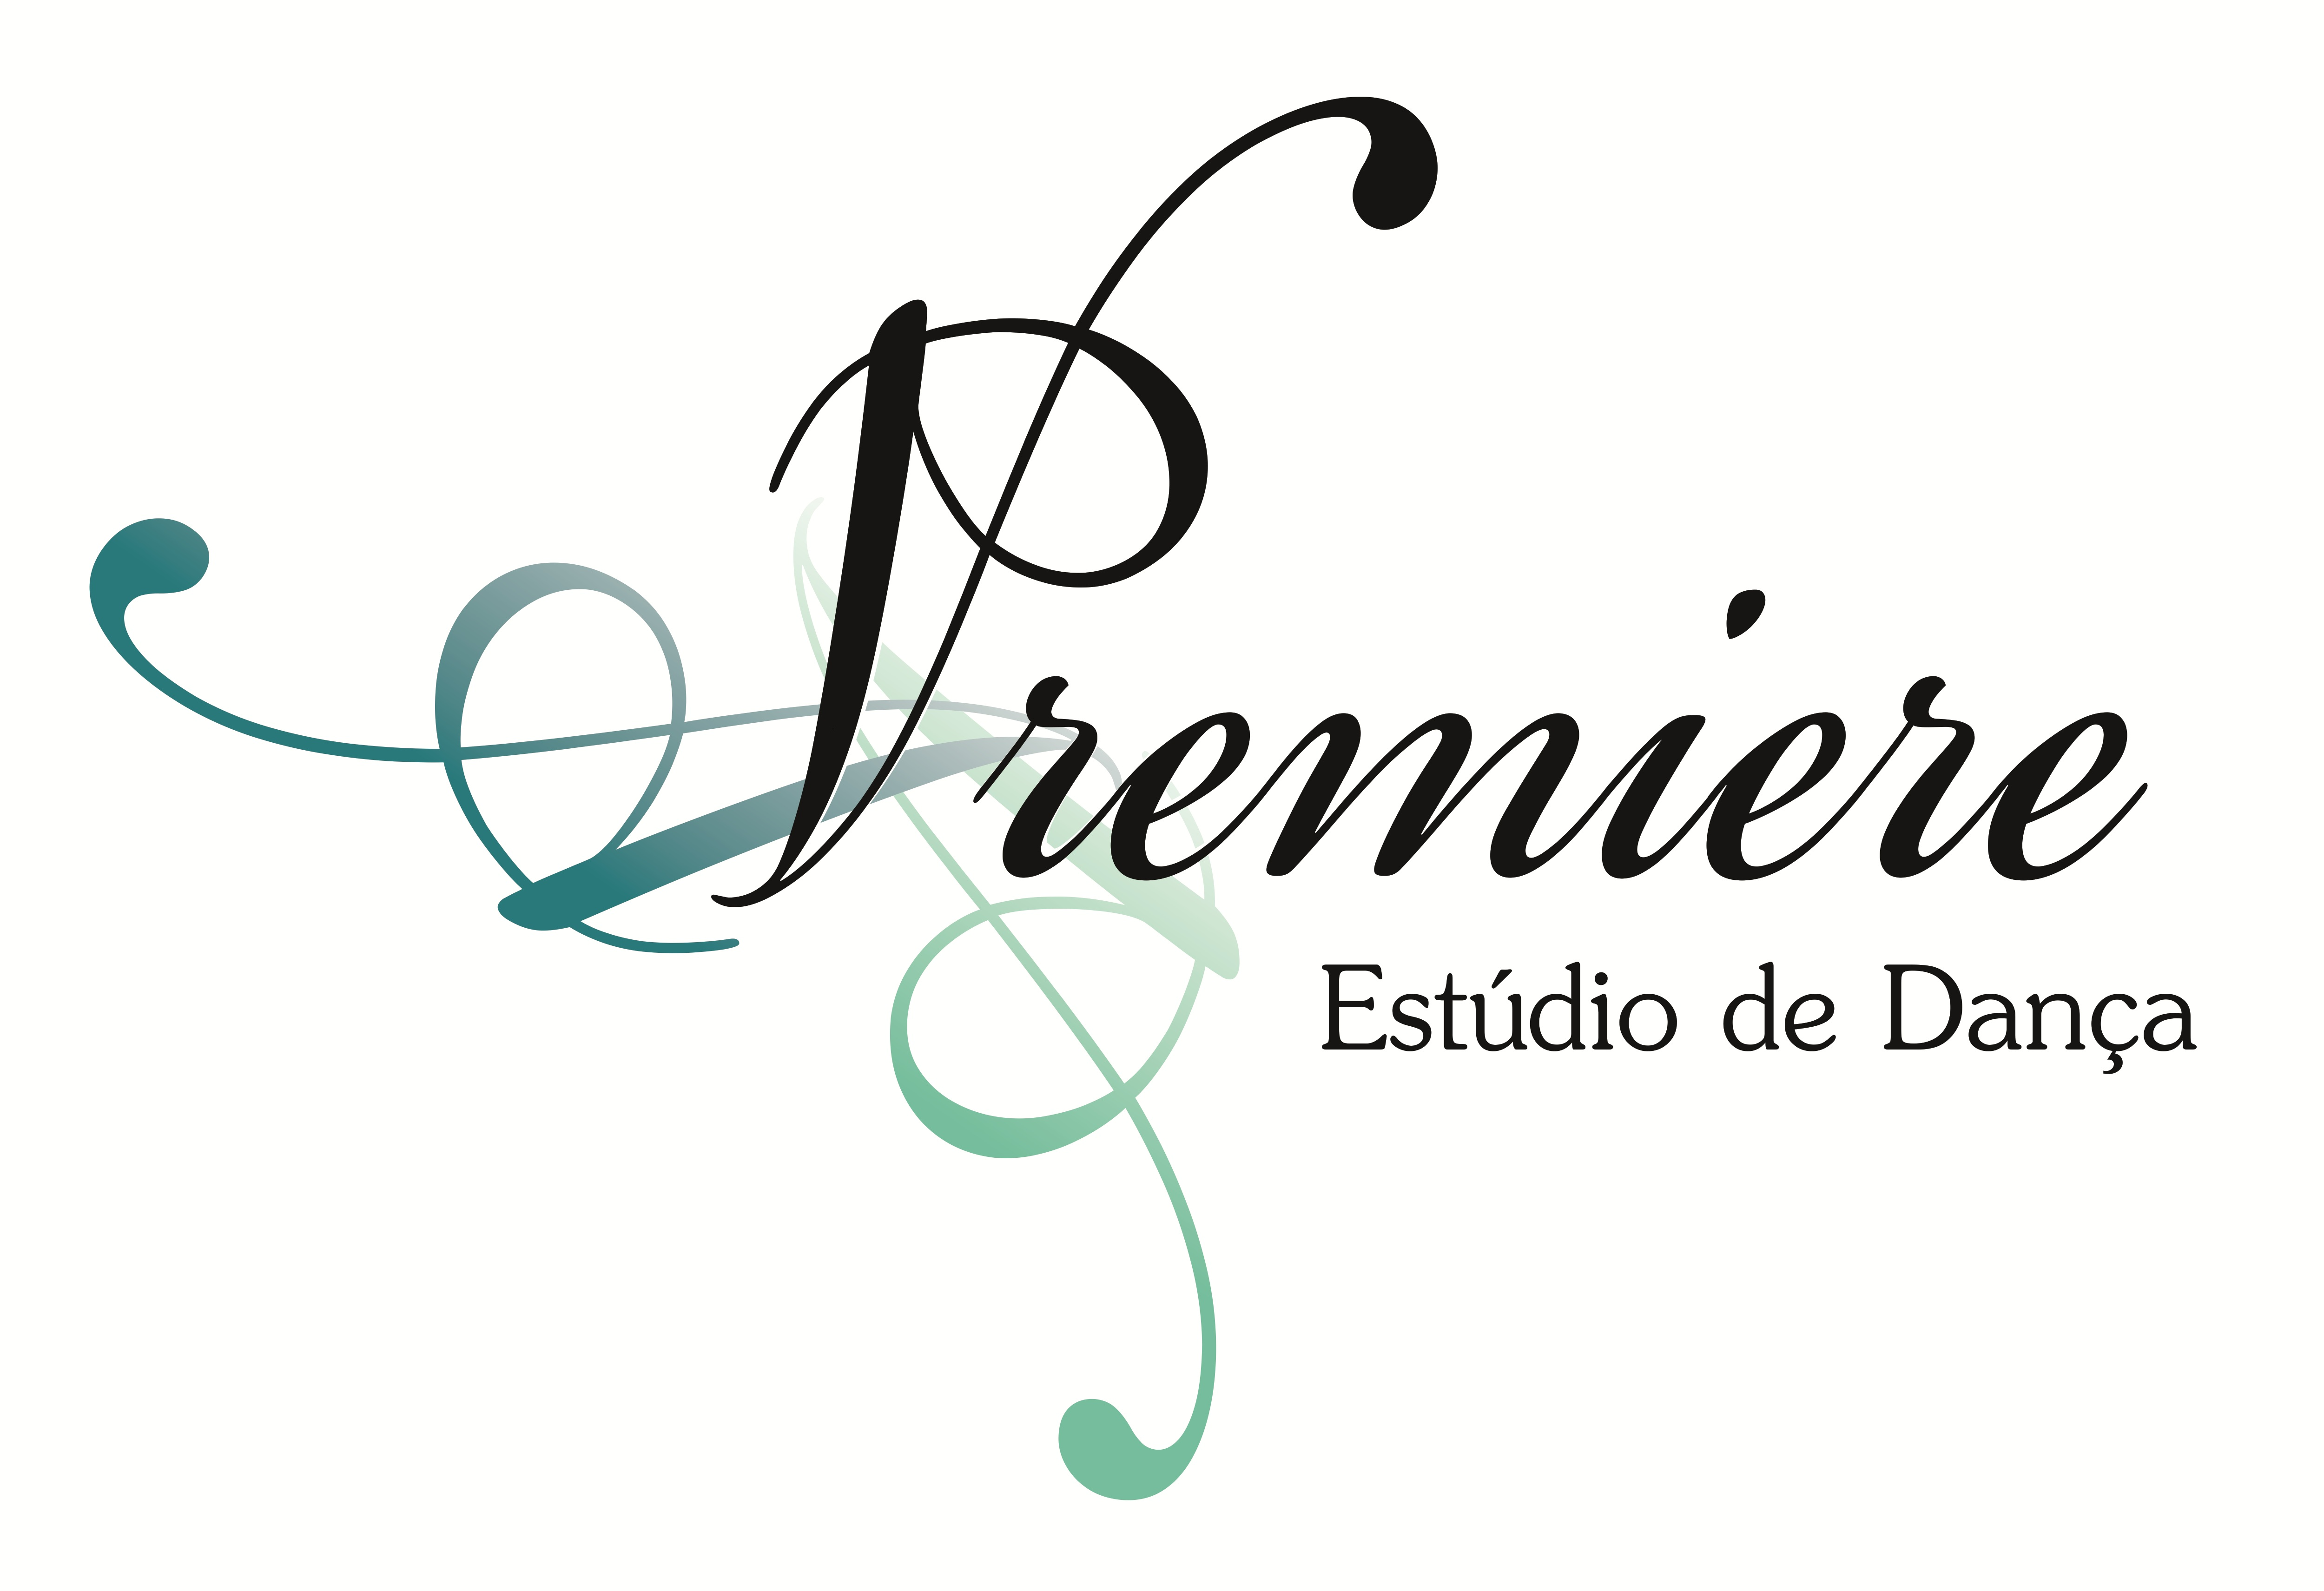 PREMIERE - Estudio de Dança